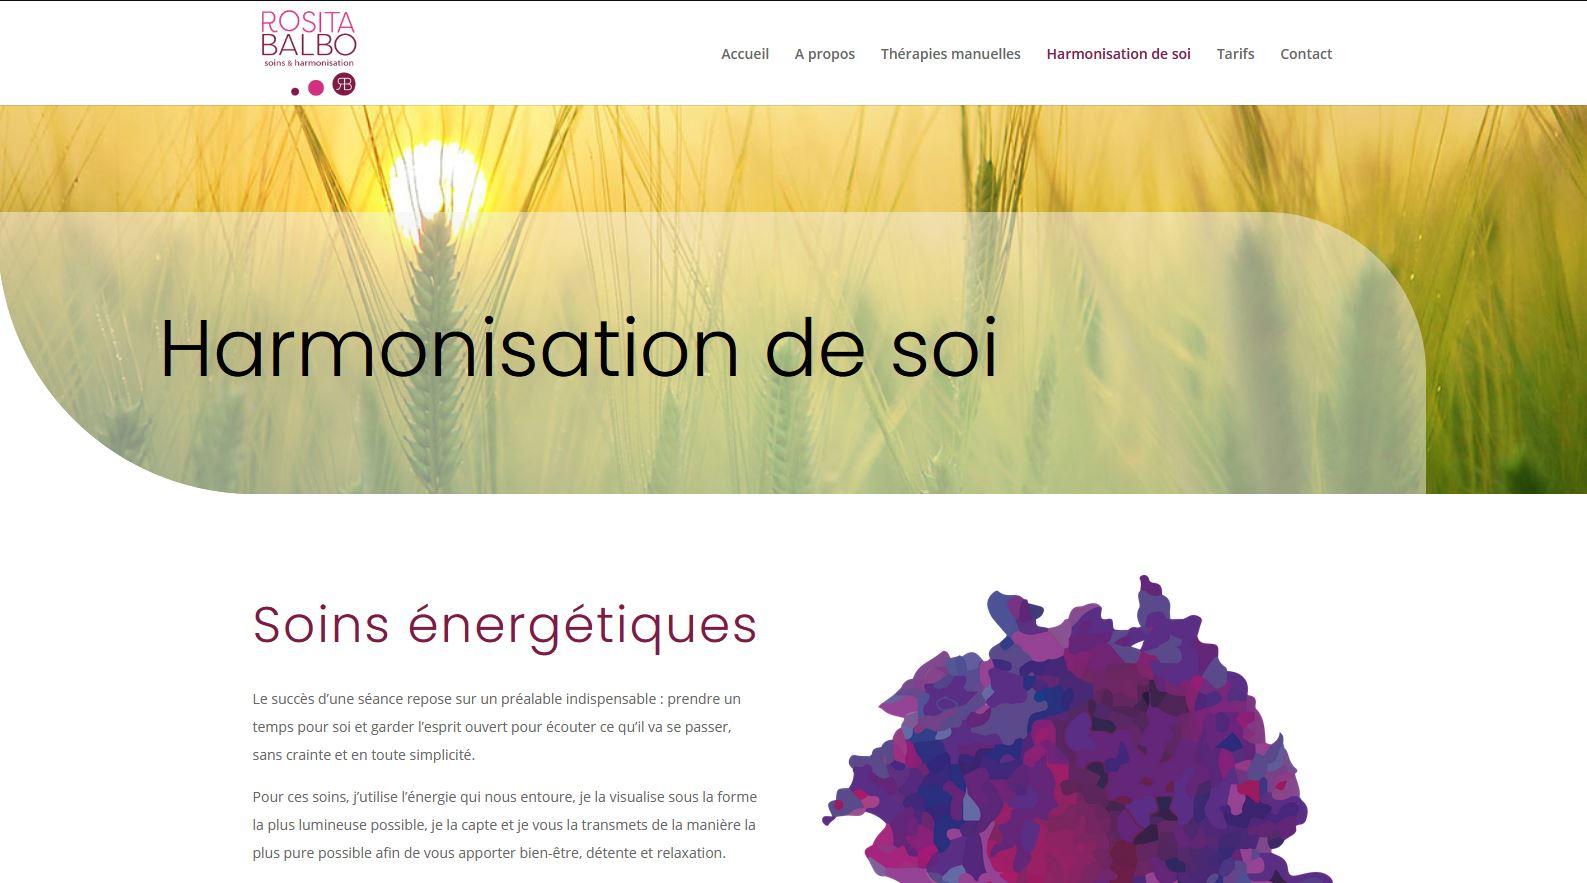 Santé - Rosita Balbo - Site internet - Page Harmonisation de soi